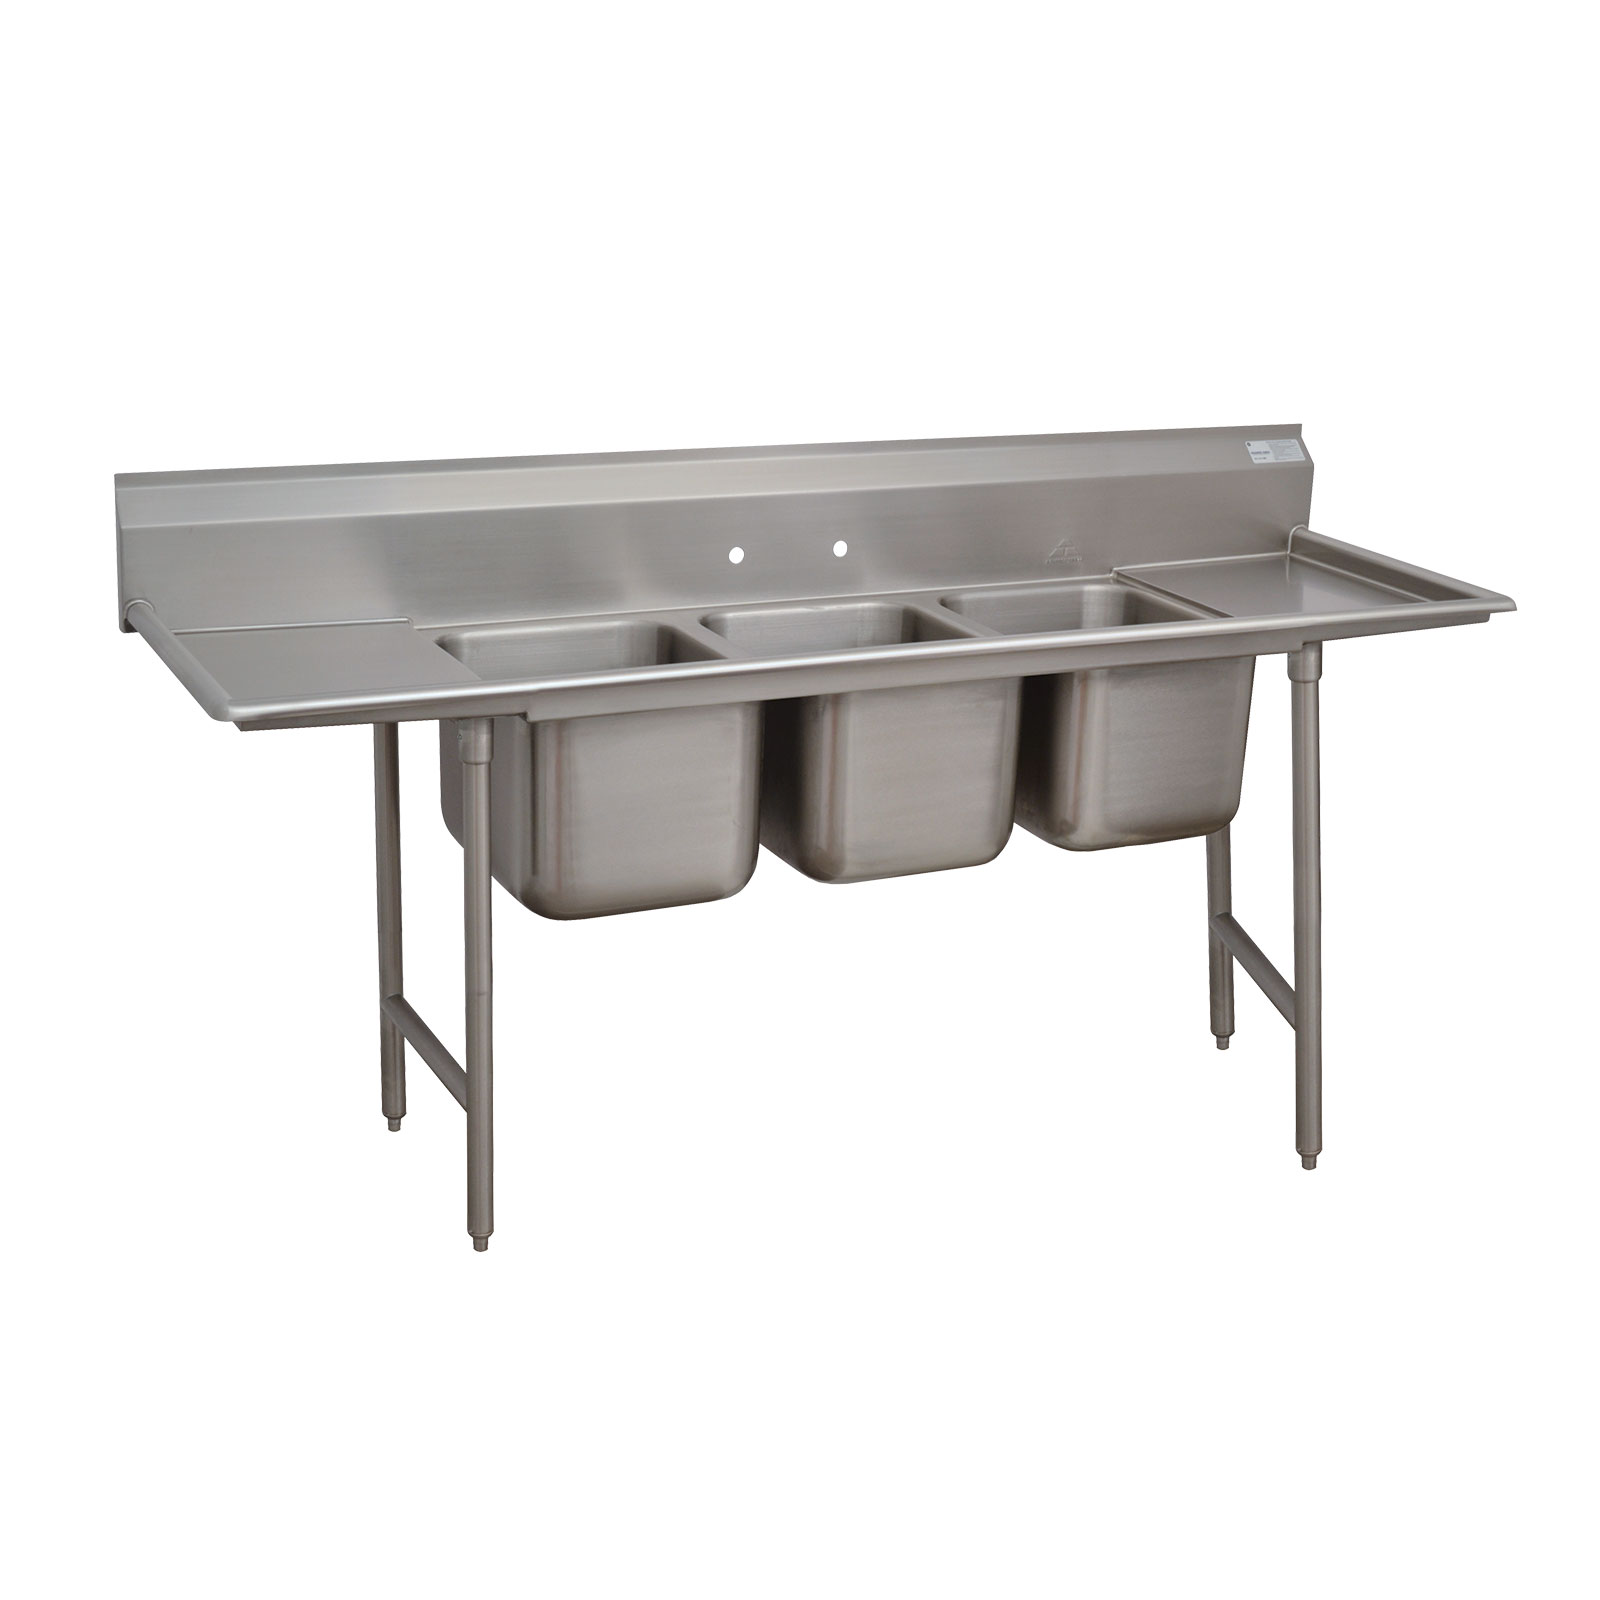 Advance Tabco T9-3-54-18L sink, (3) three compartment